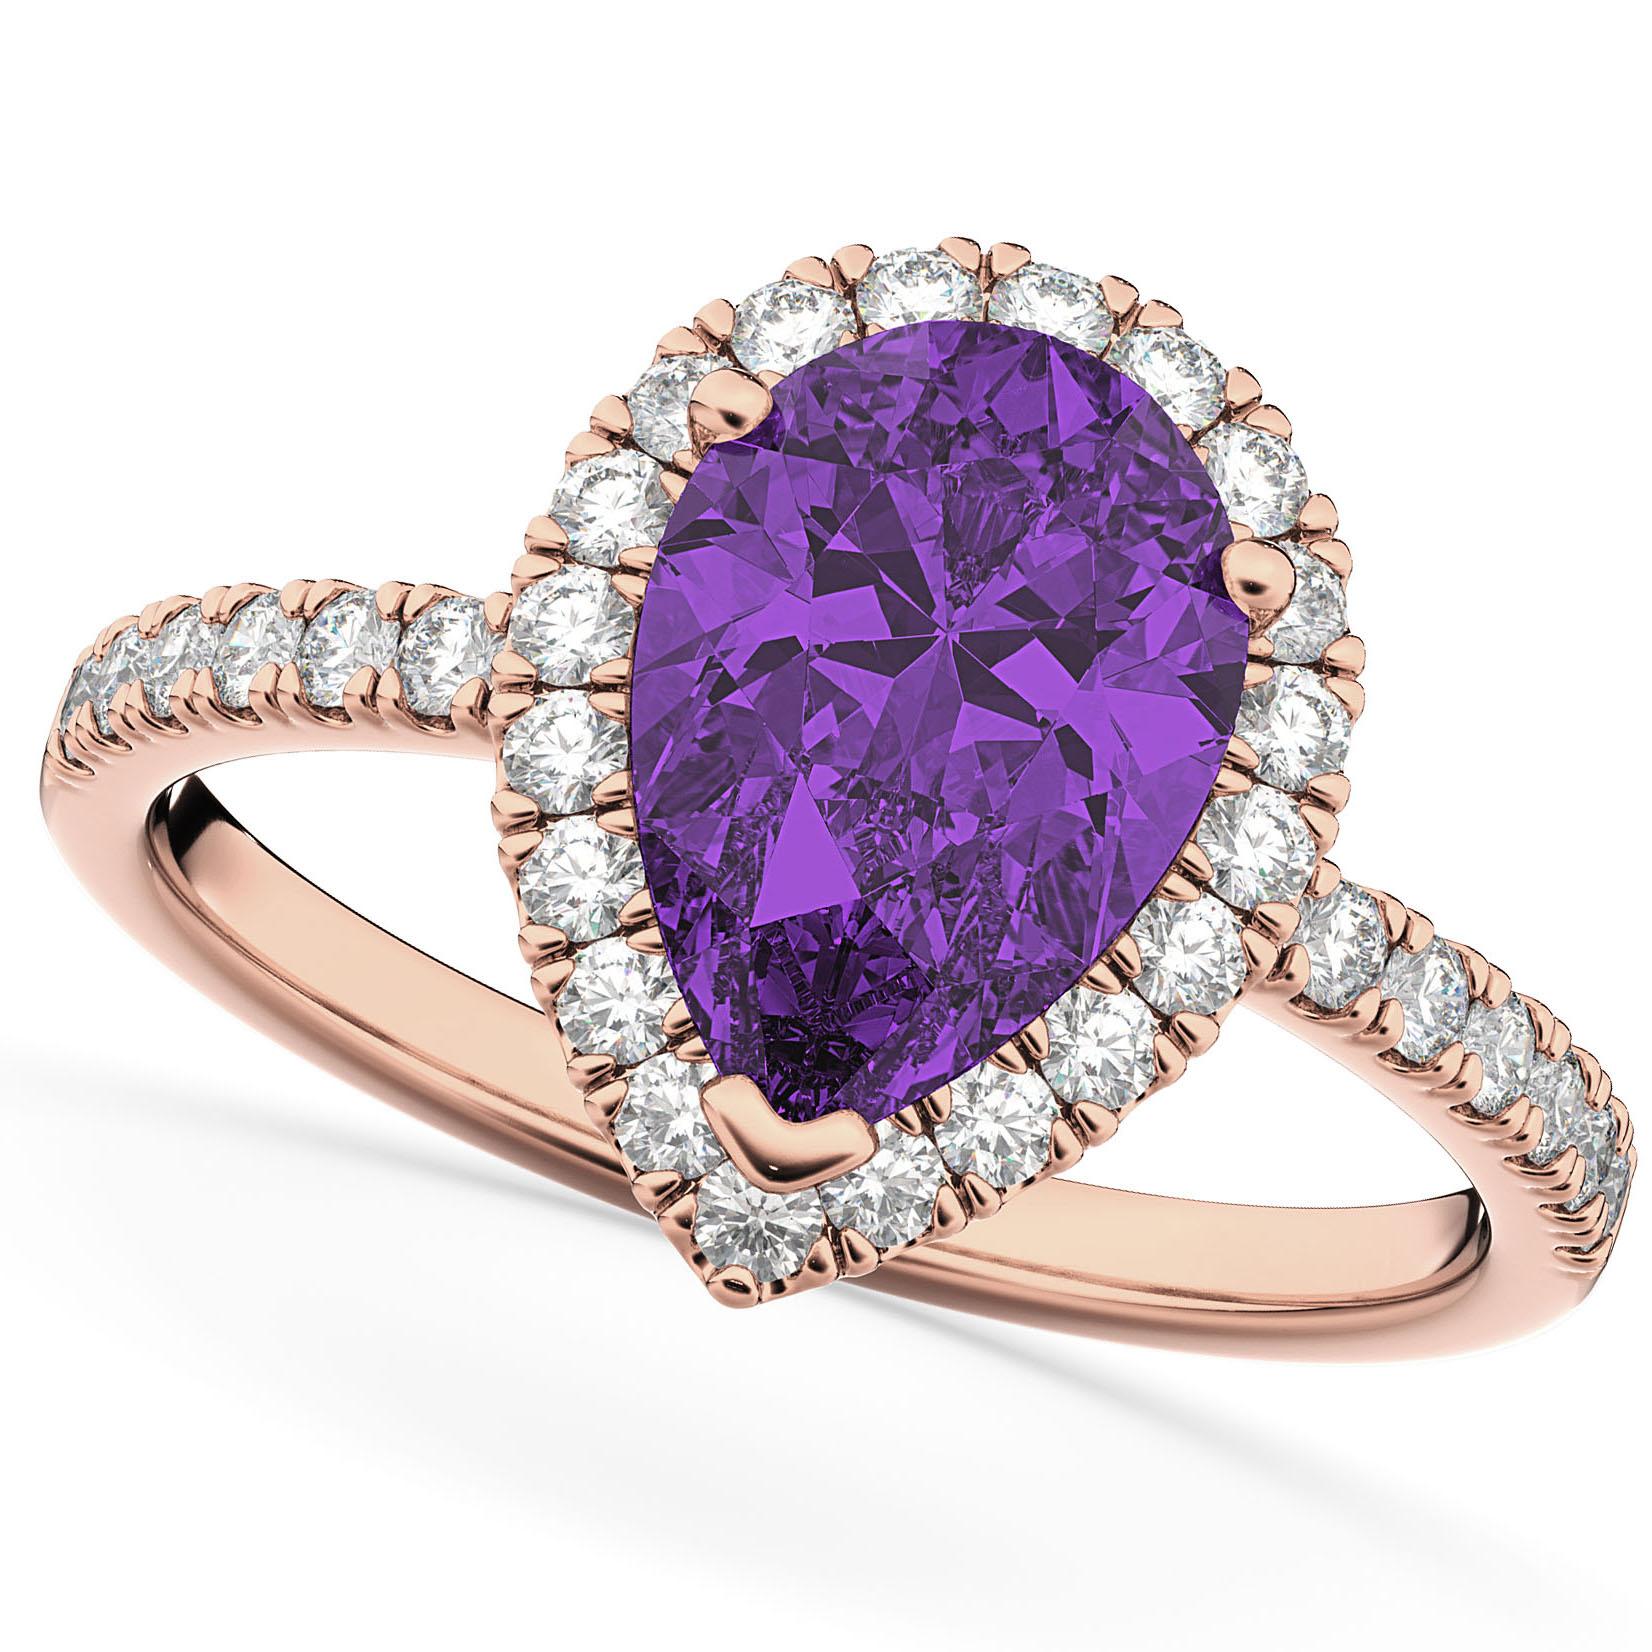 Pear Cut Halo Amethyst & Diamond Engagement Ring 14K Rose Gold 2.21ct